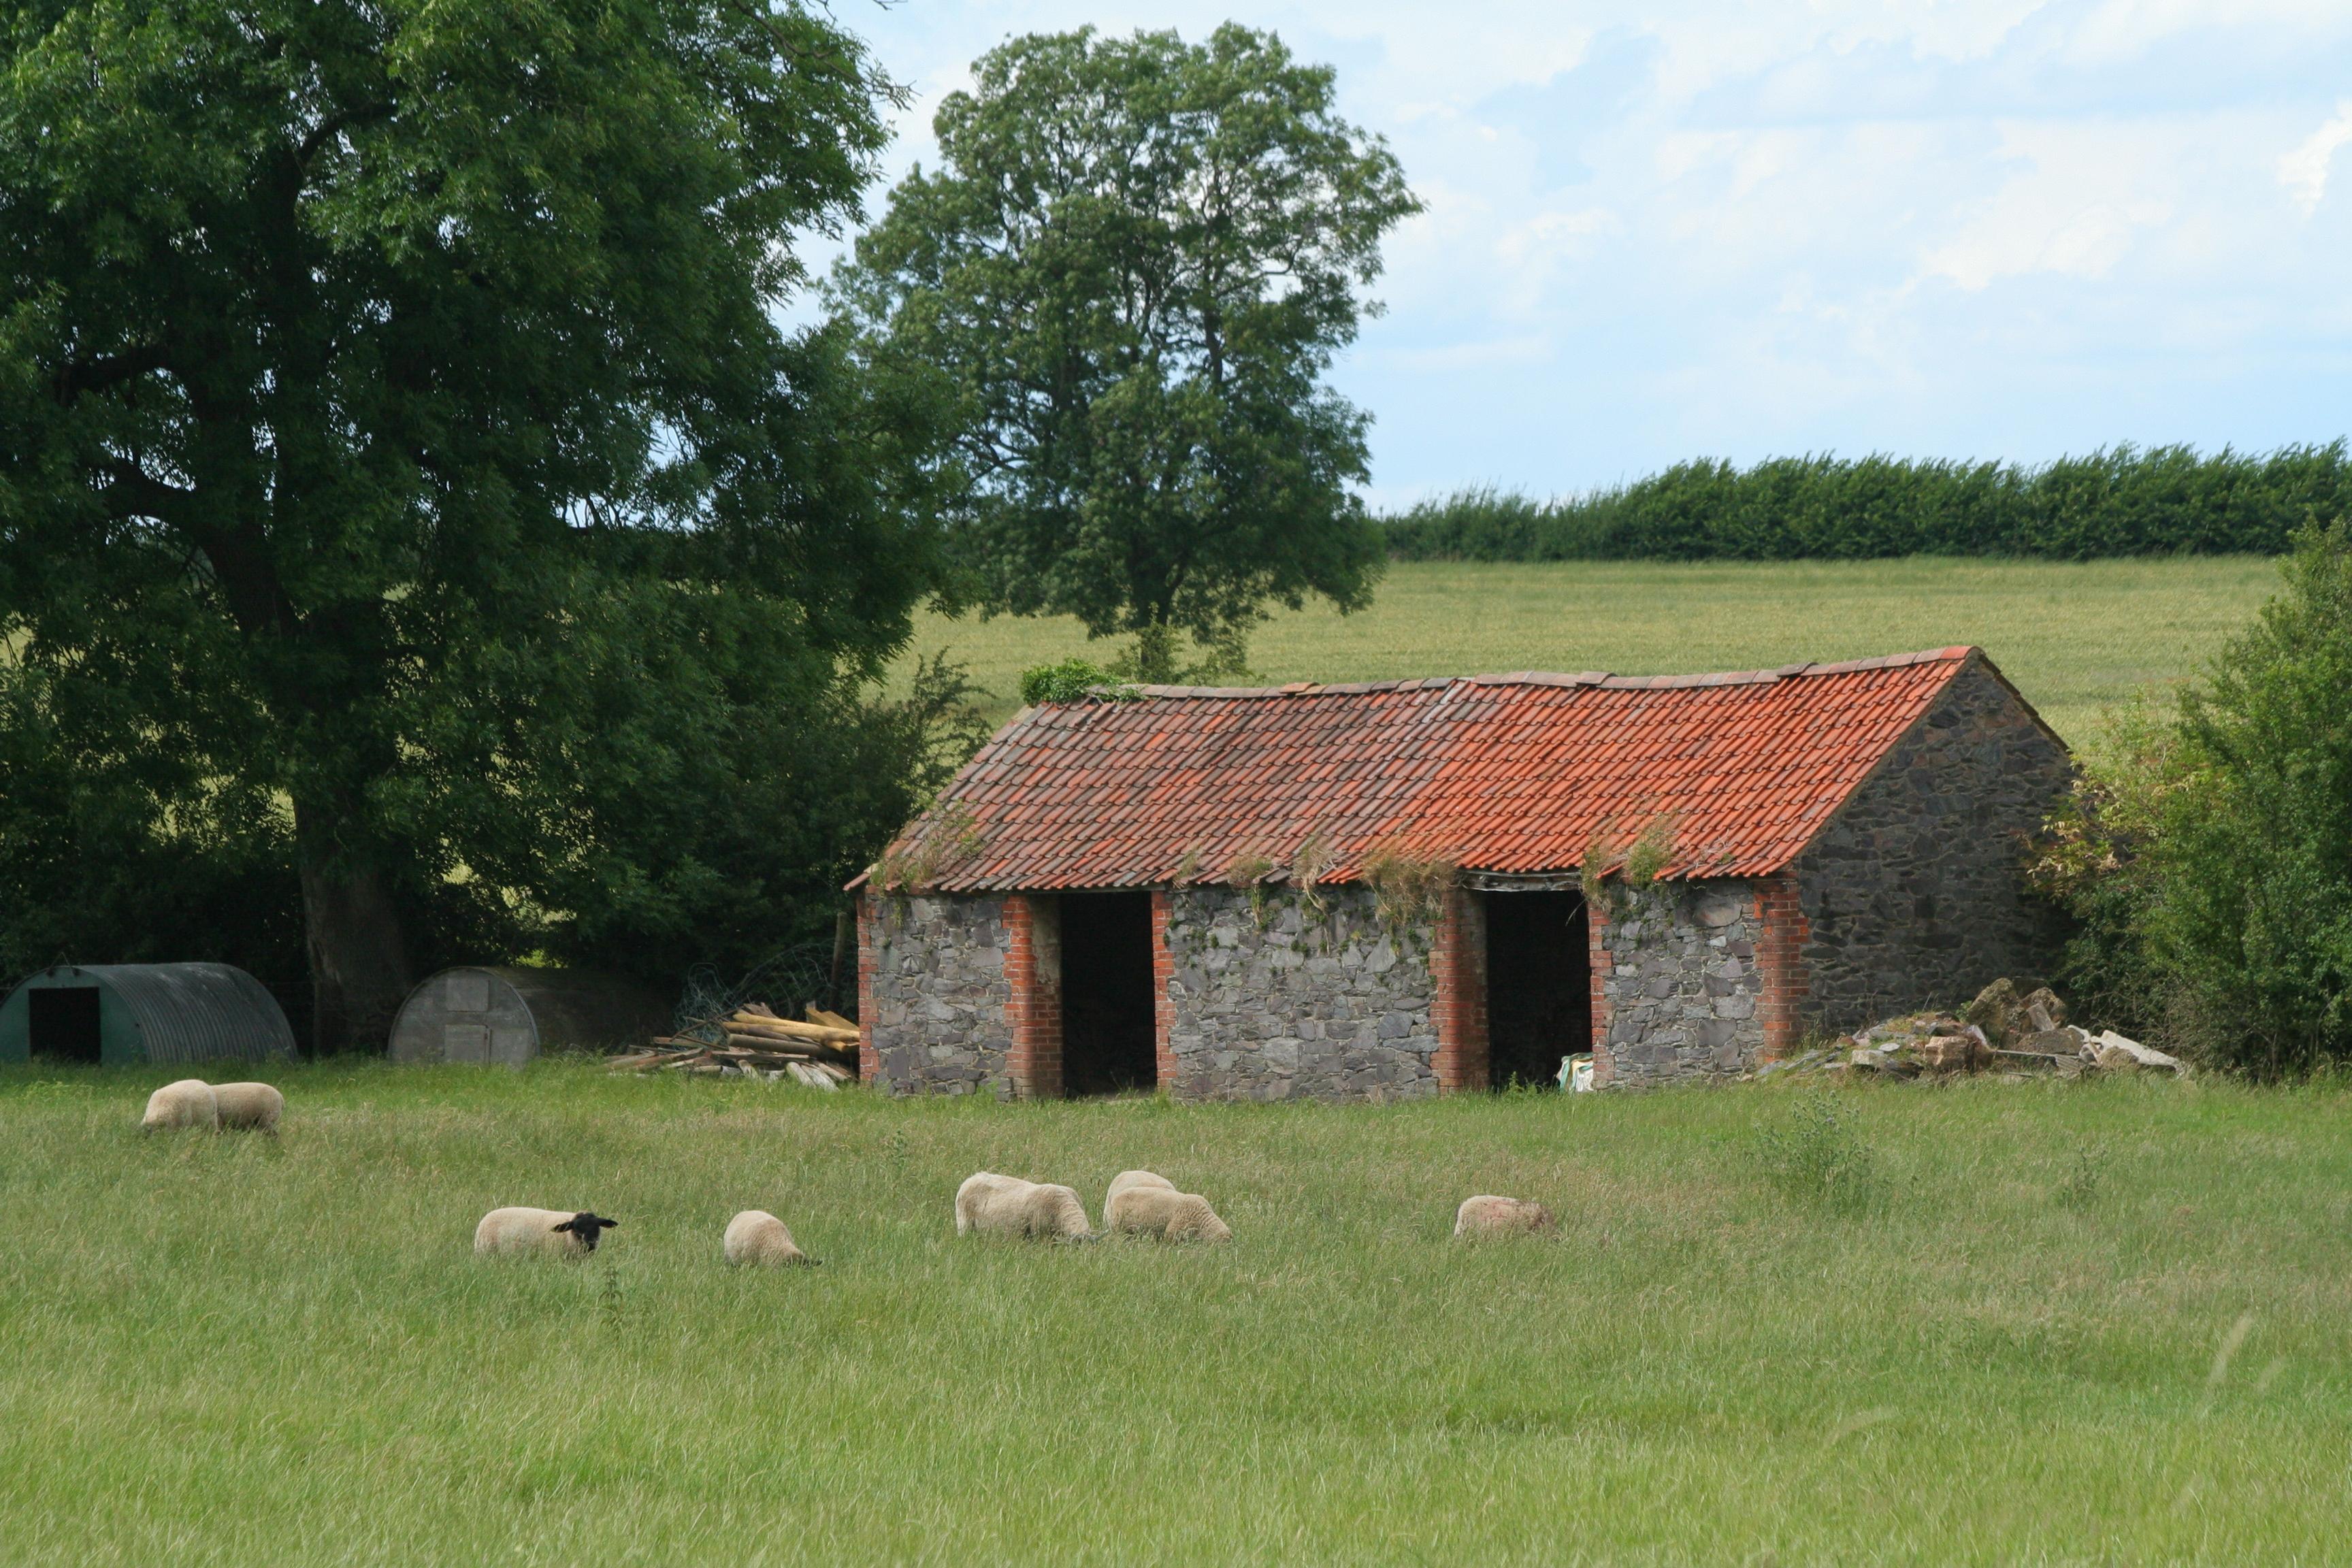 File:Barn, Whatoff Lodge Farm (3690257299).jpg - Wikimedia ...